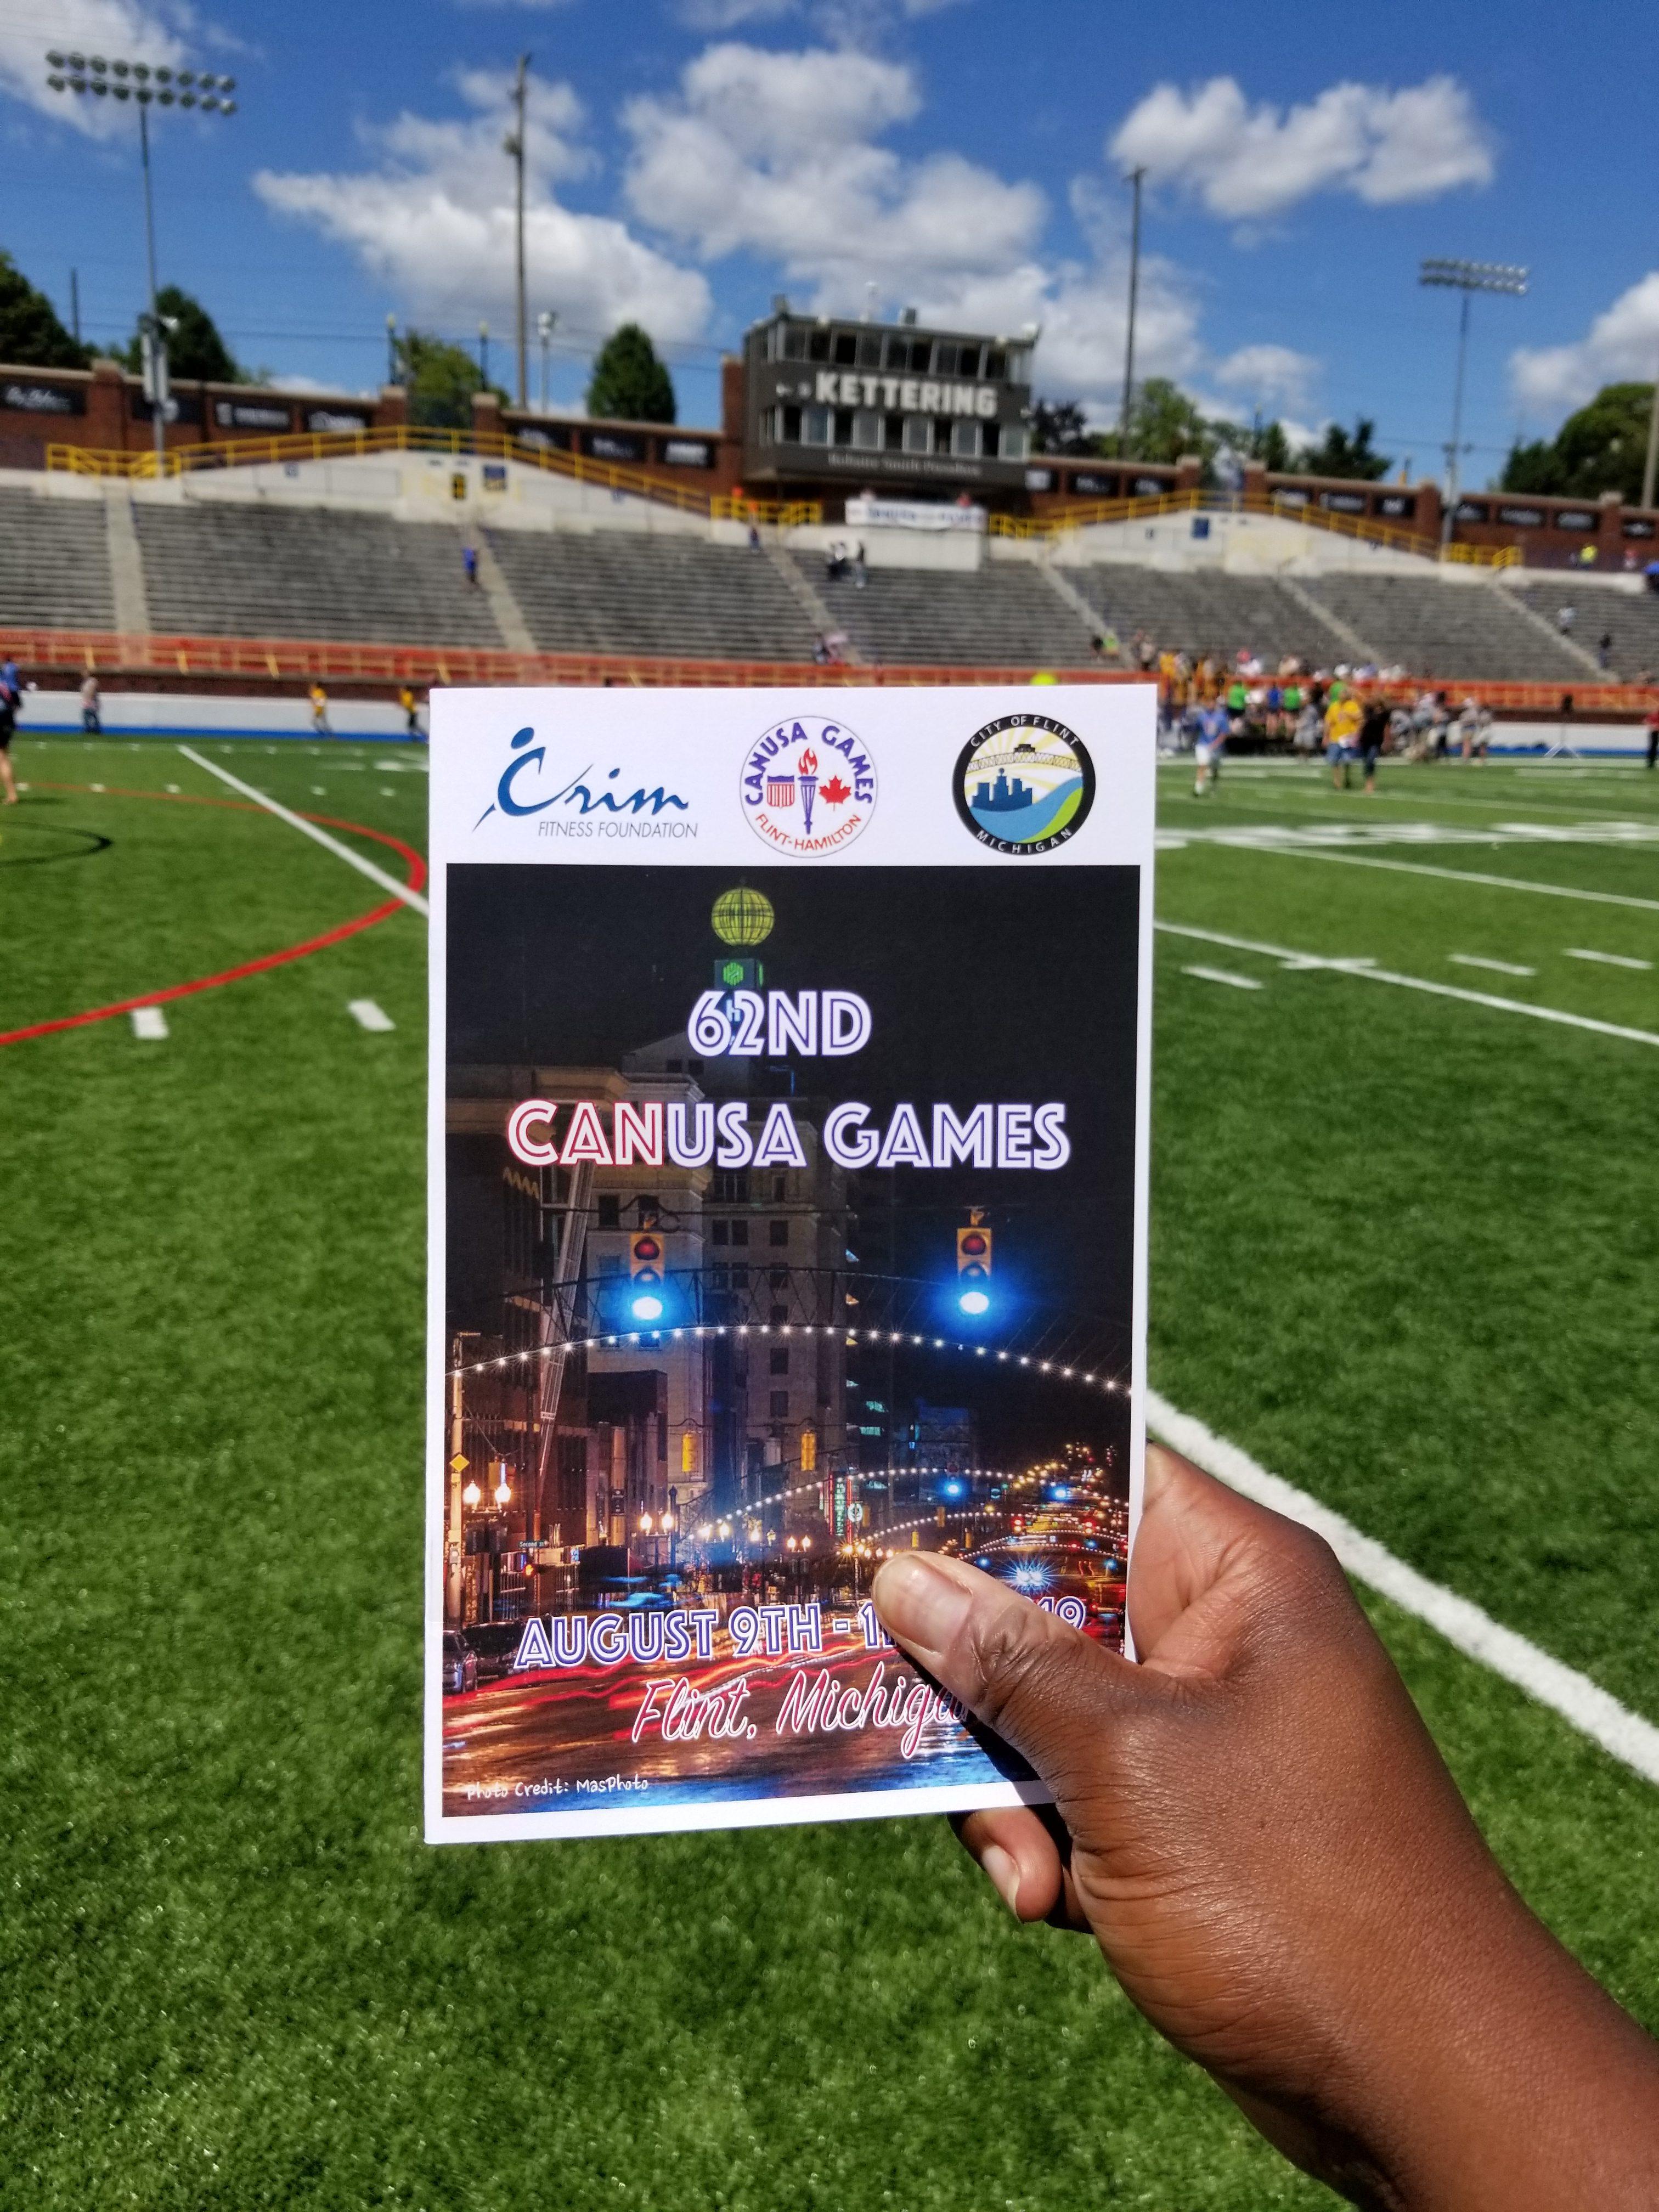 Canusa Games